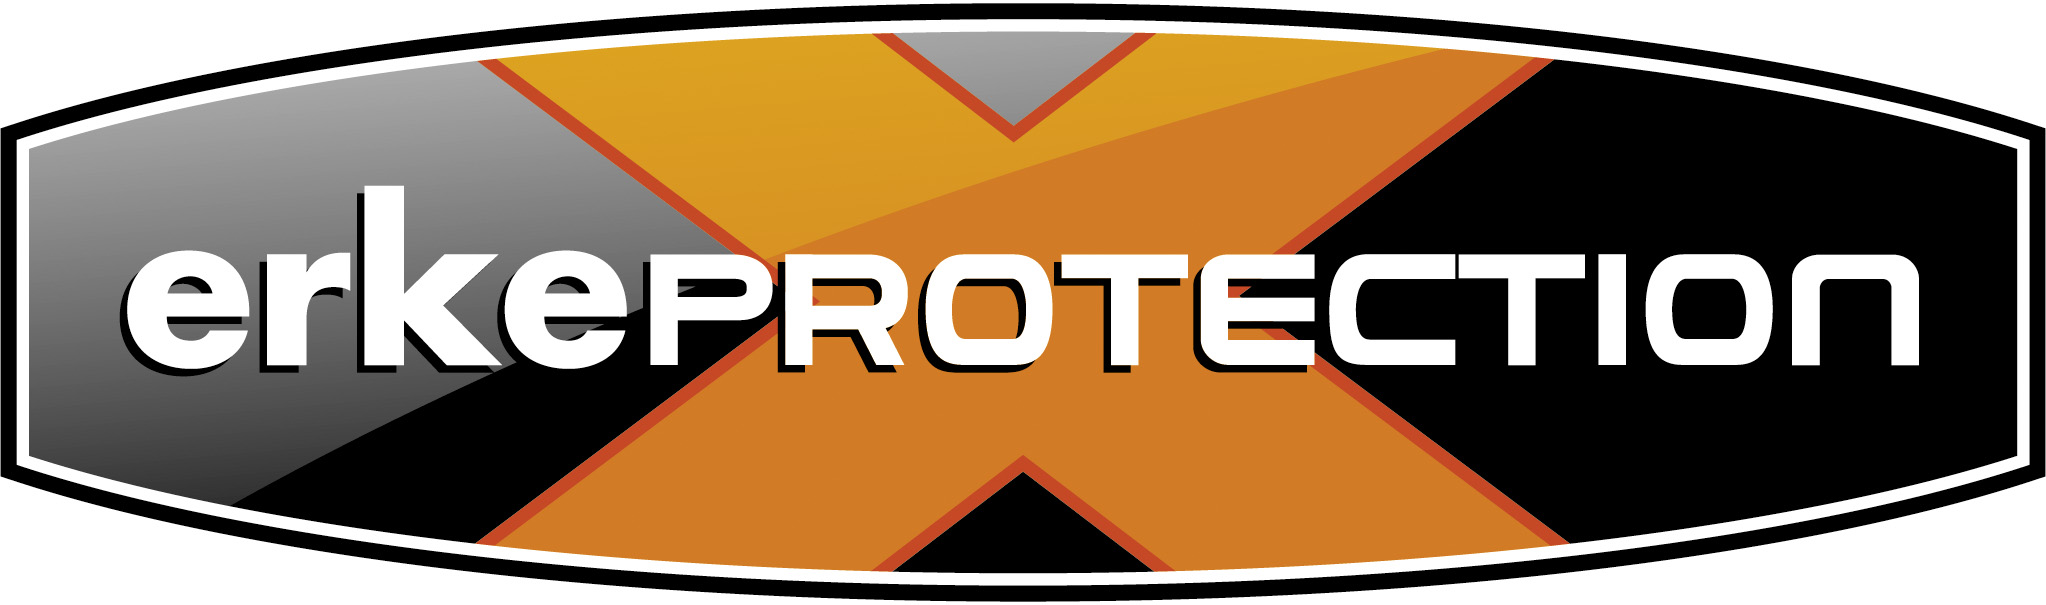 www.erkeprotection.com